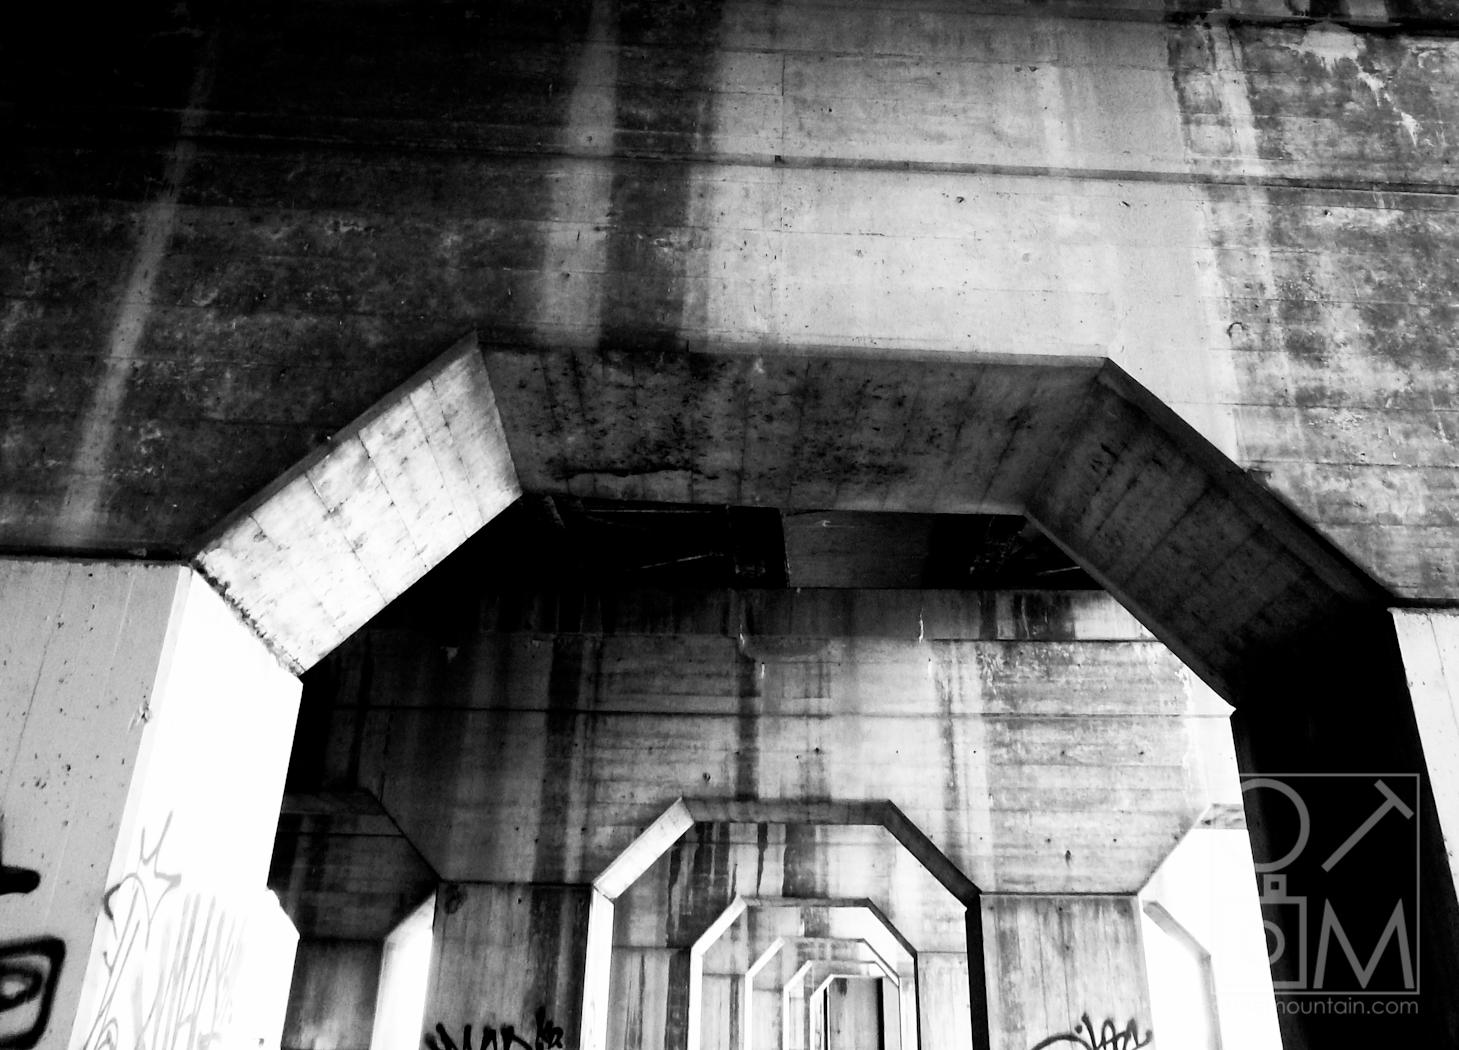 Philly - JFK Overpass - 3